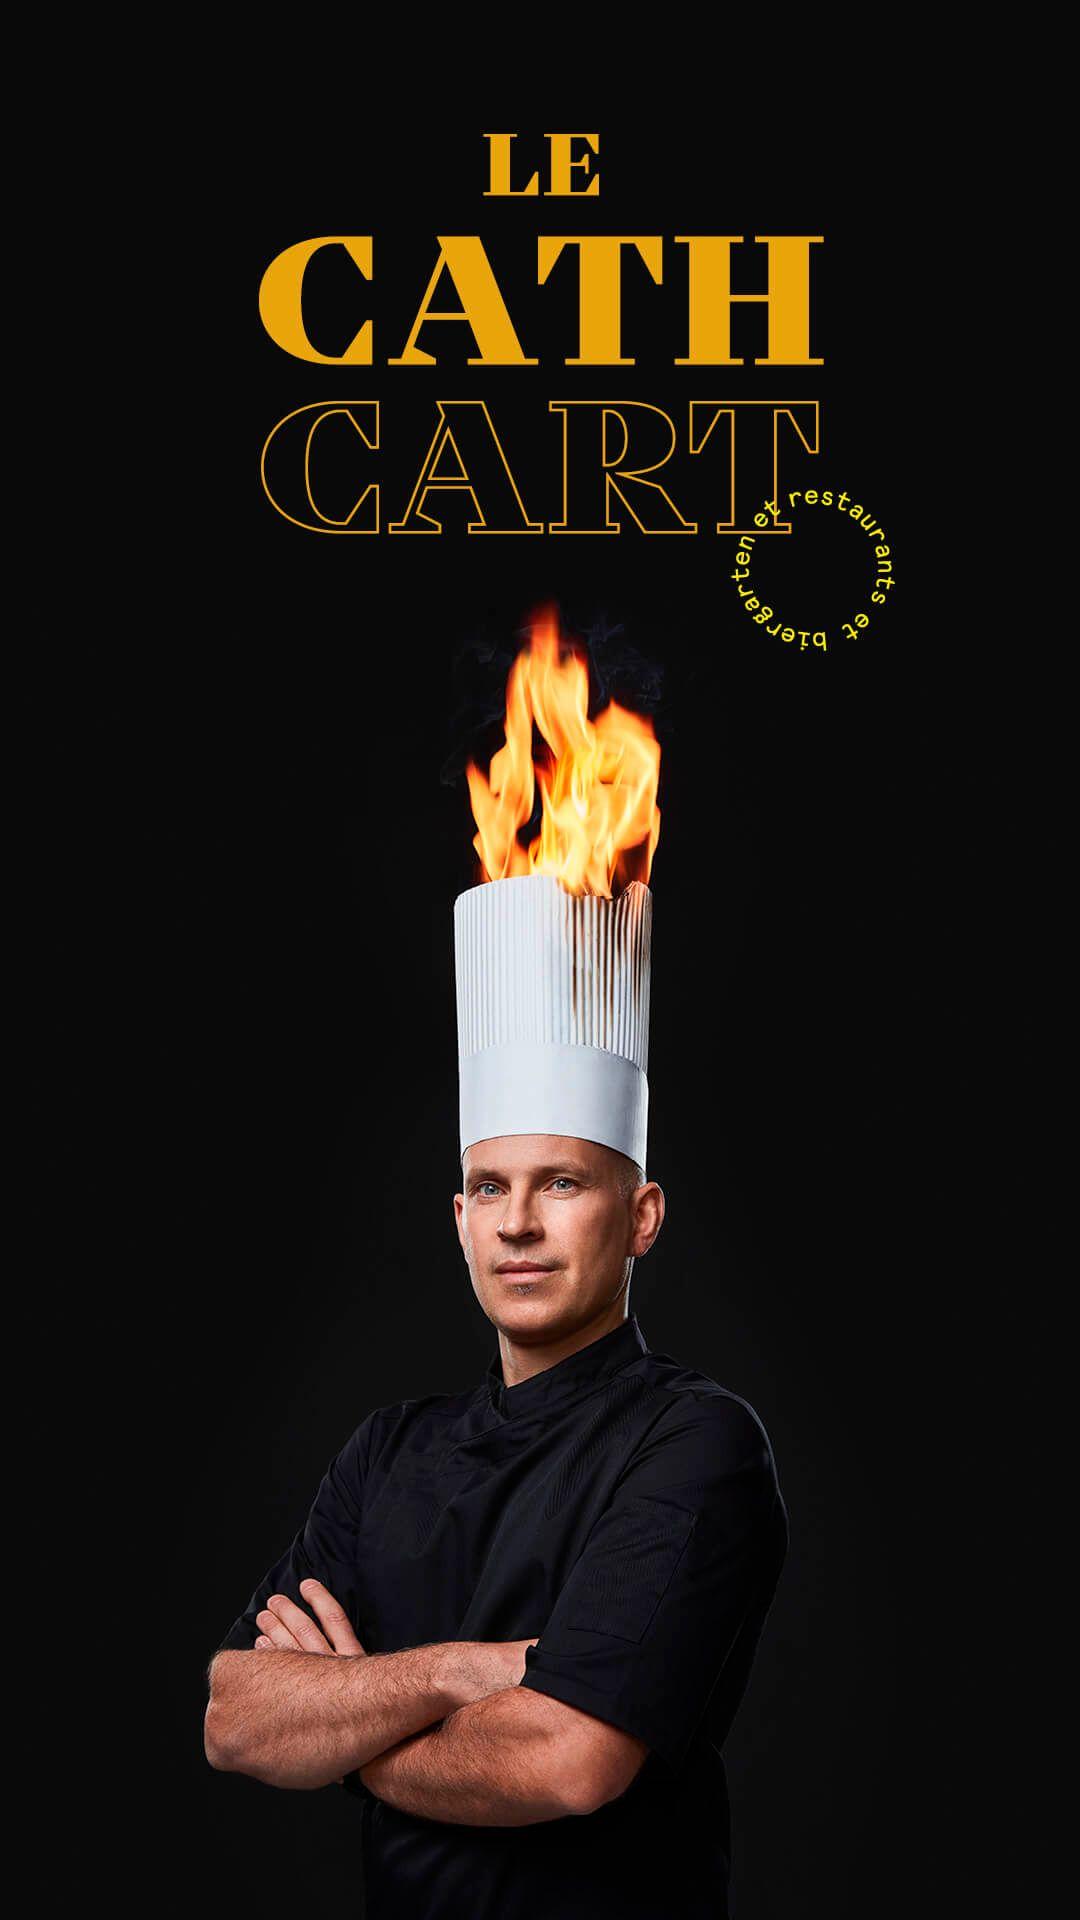 Lionel Piraux by Jocelyn Michel for Cathcart restaurant